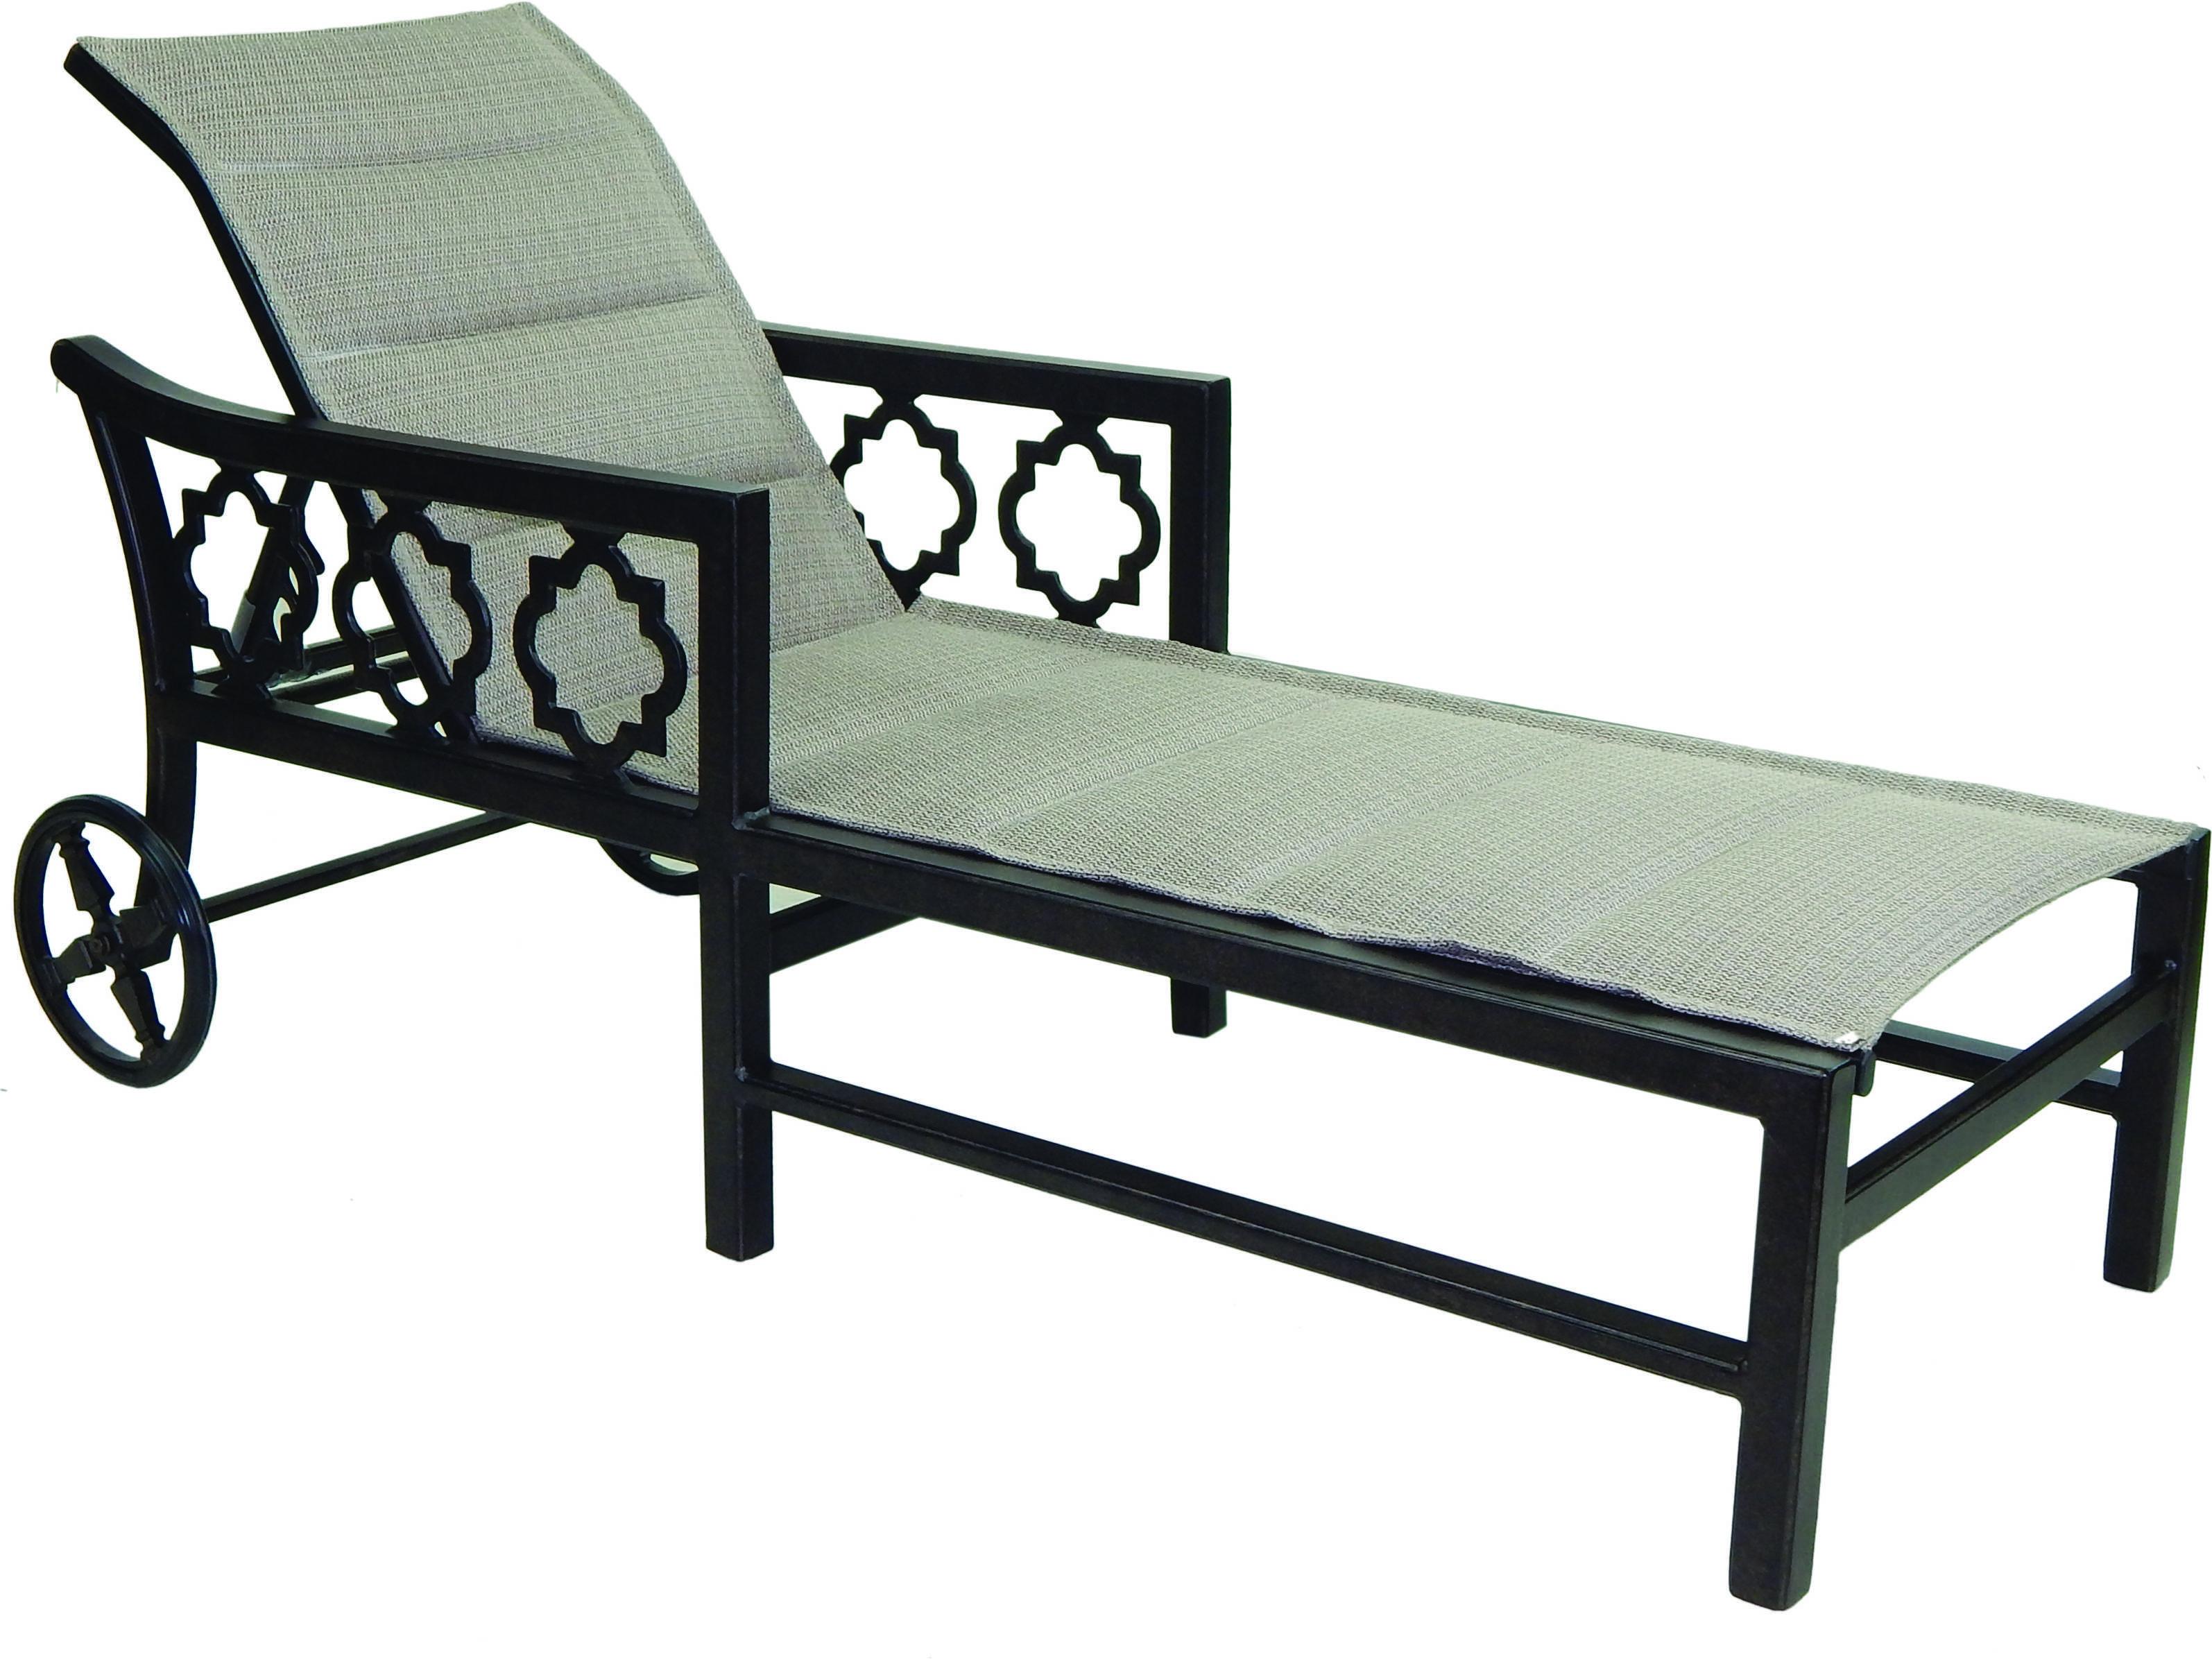 Castelle belle epoque sling cast auminum adjustable chaise for Cast aluminum chaise lounge with wheels